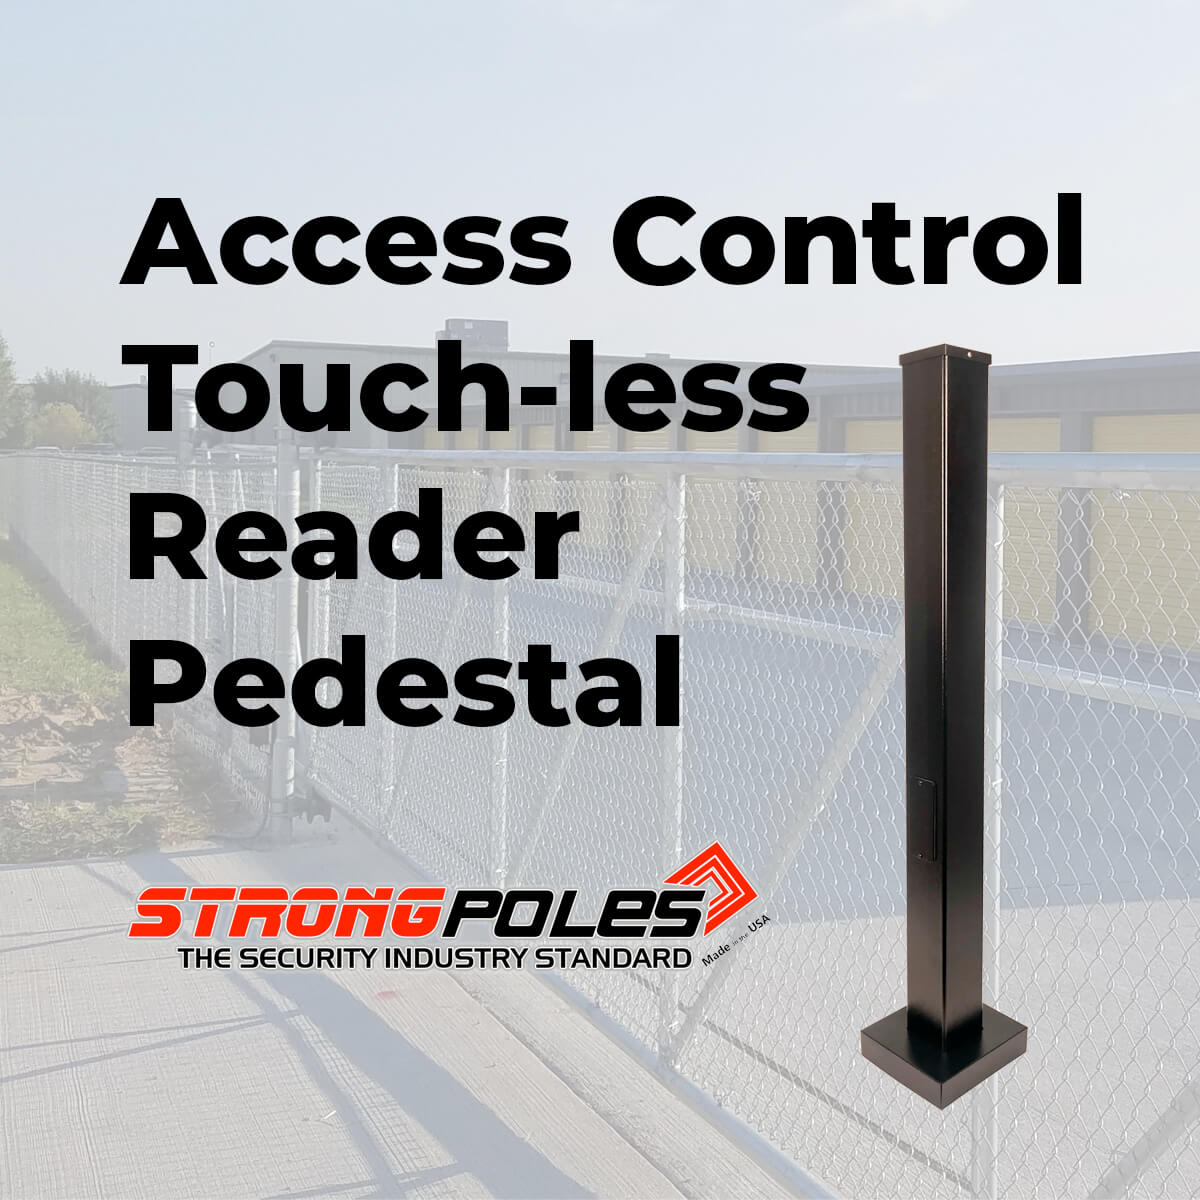 Access Control Touch-less Reader Pedestal